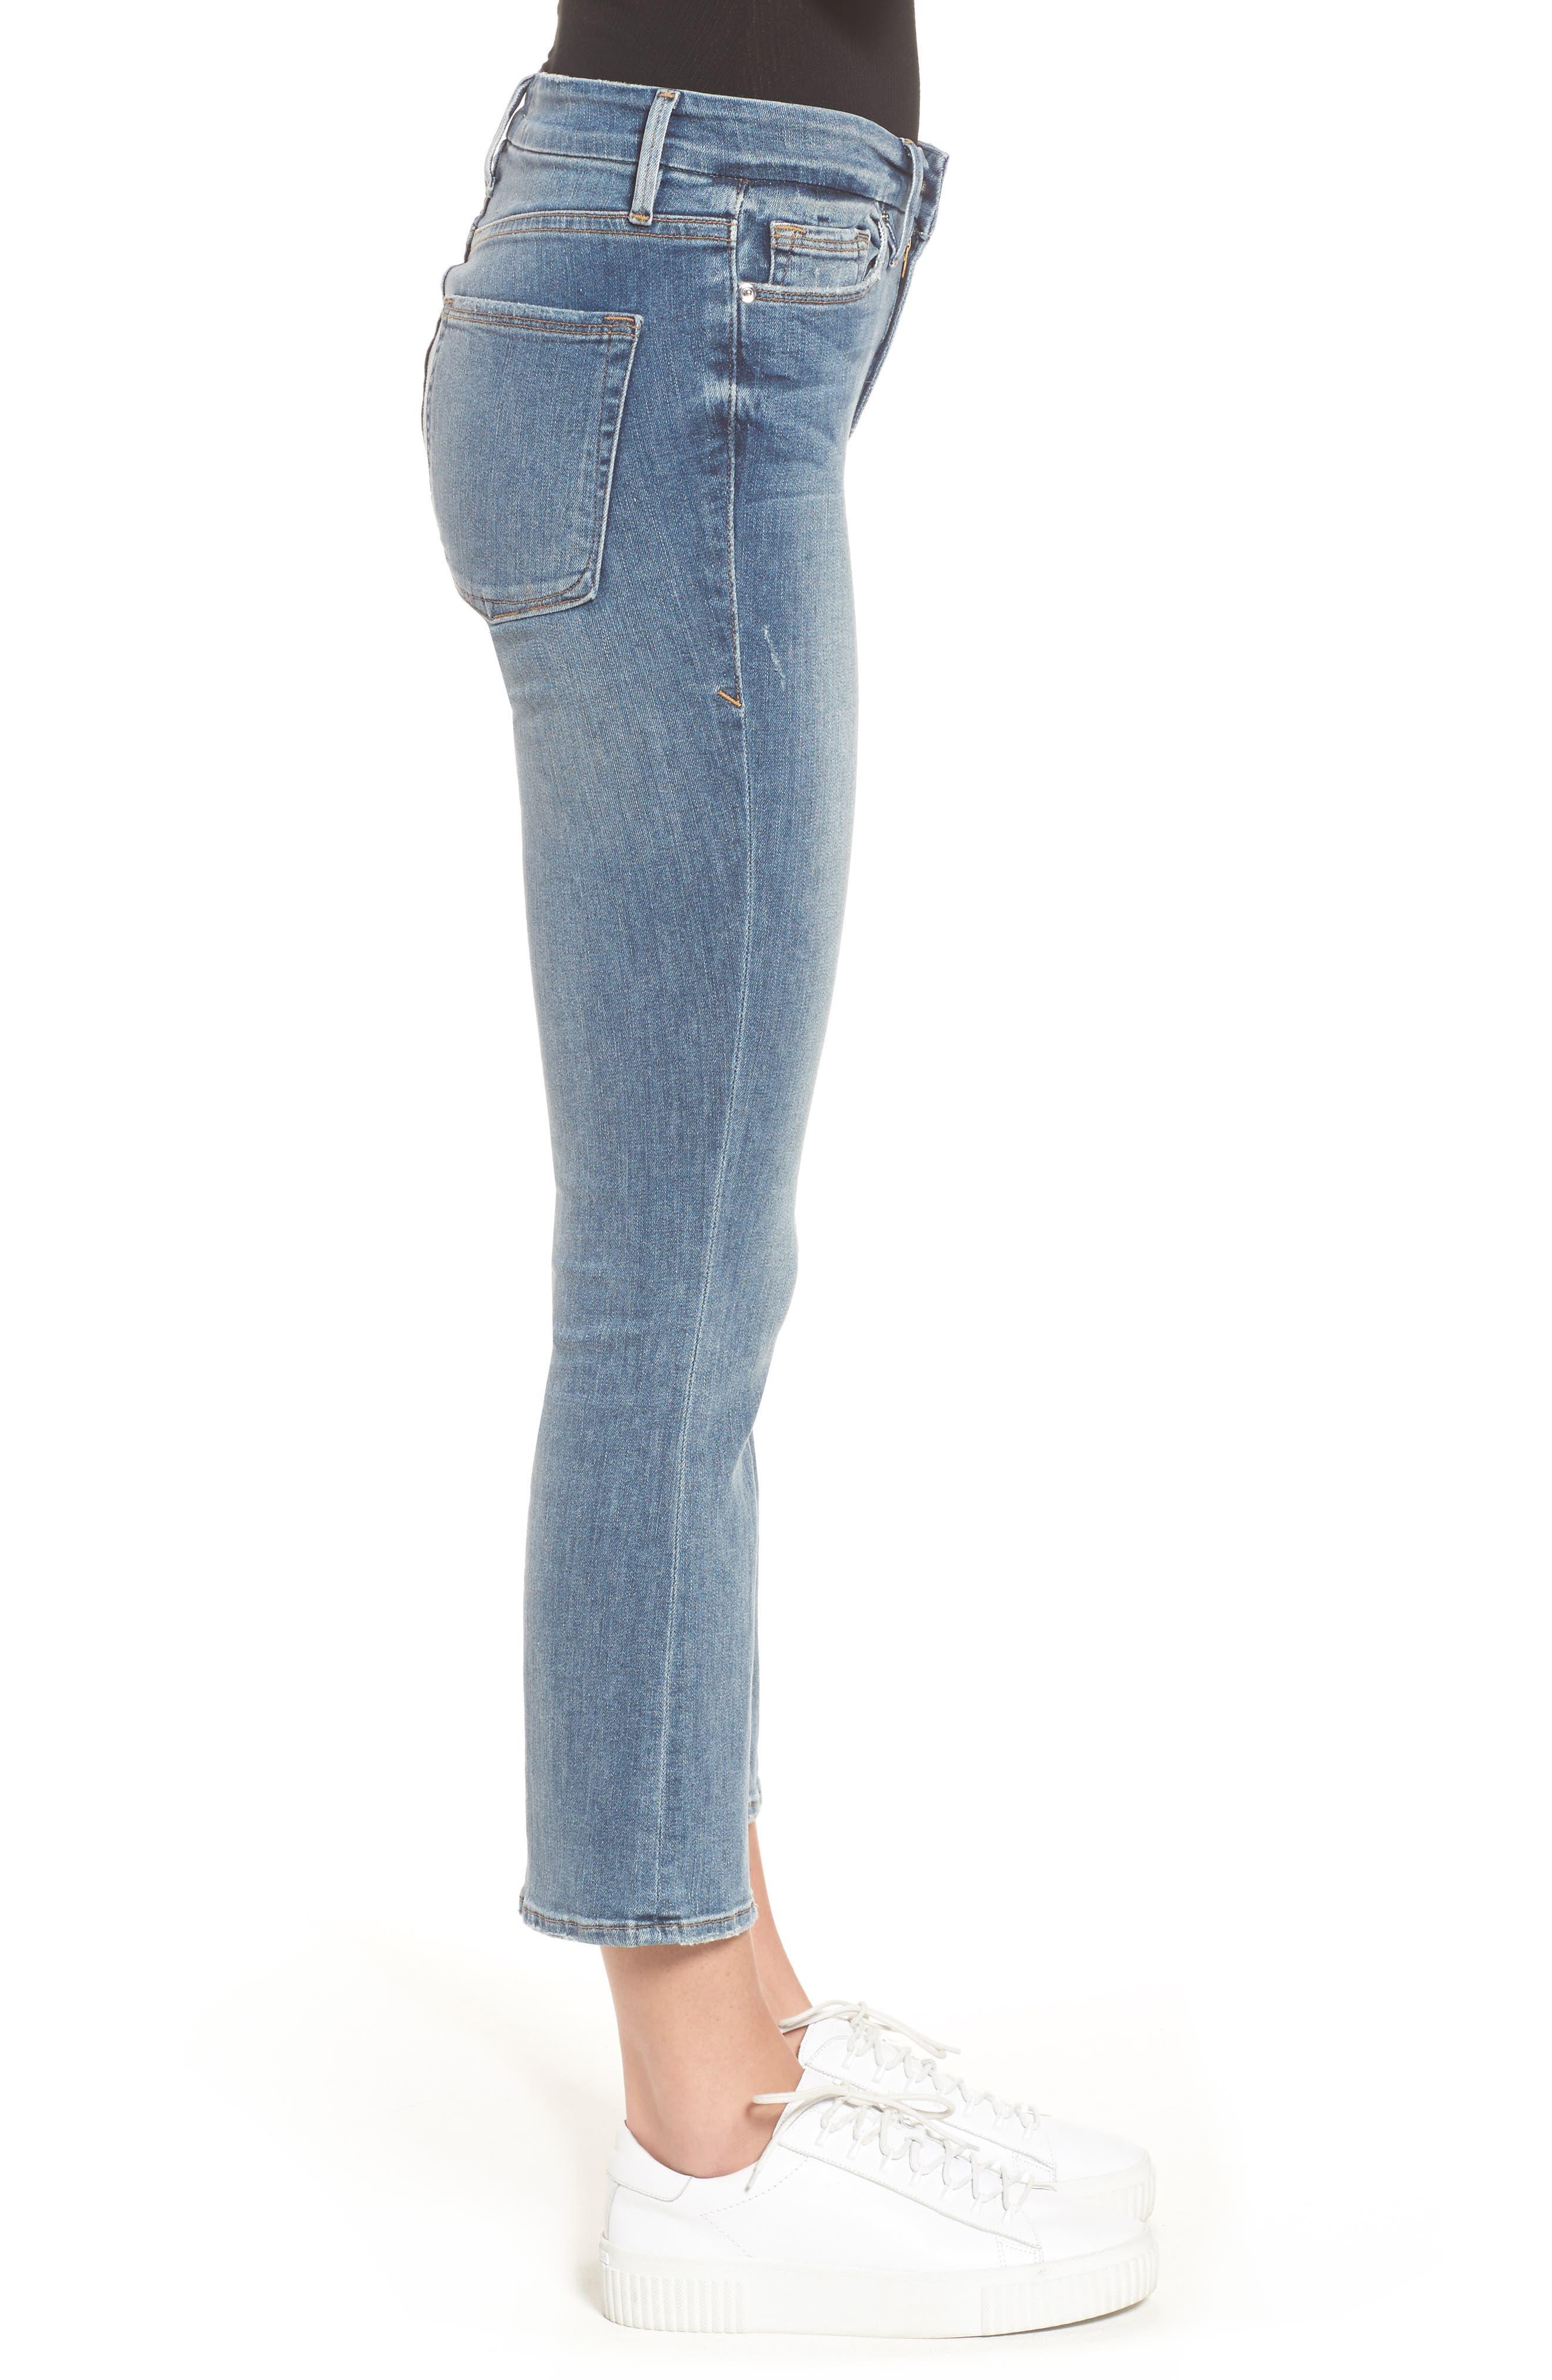 Good Cuts High Rise Boyfriend Jeans,                             Alternate thumbnail 3, color,                             Blue 012